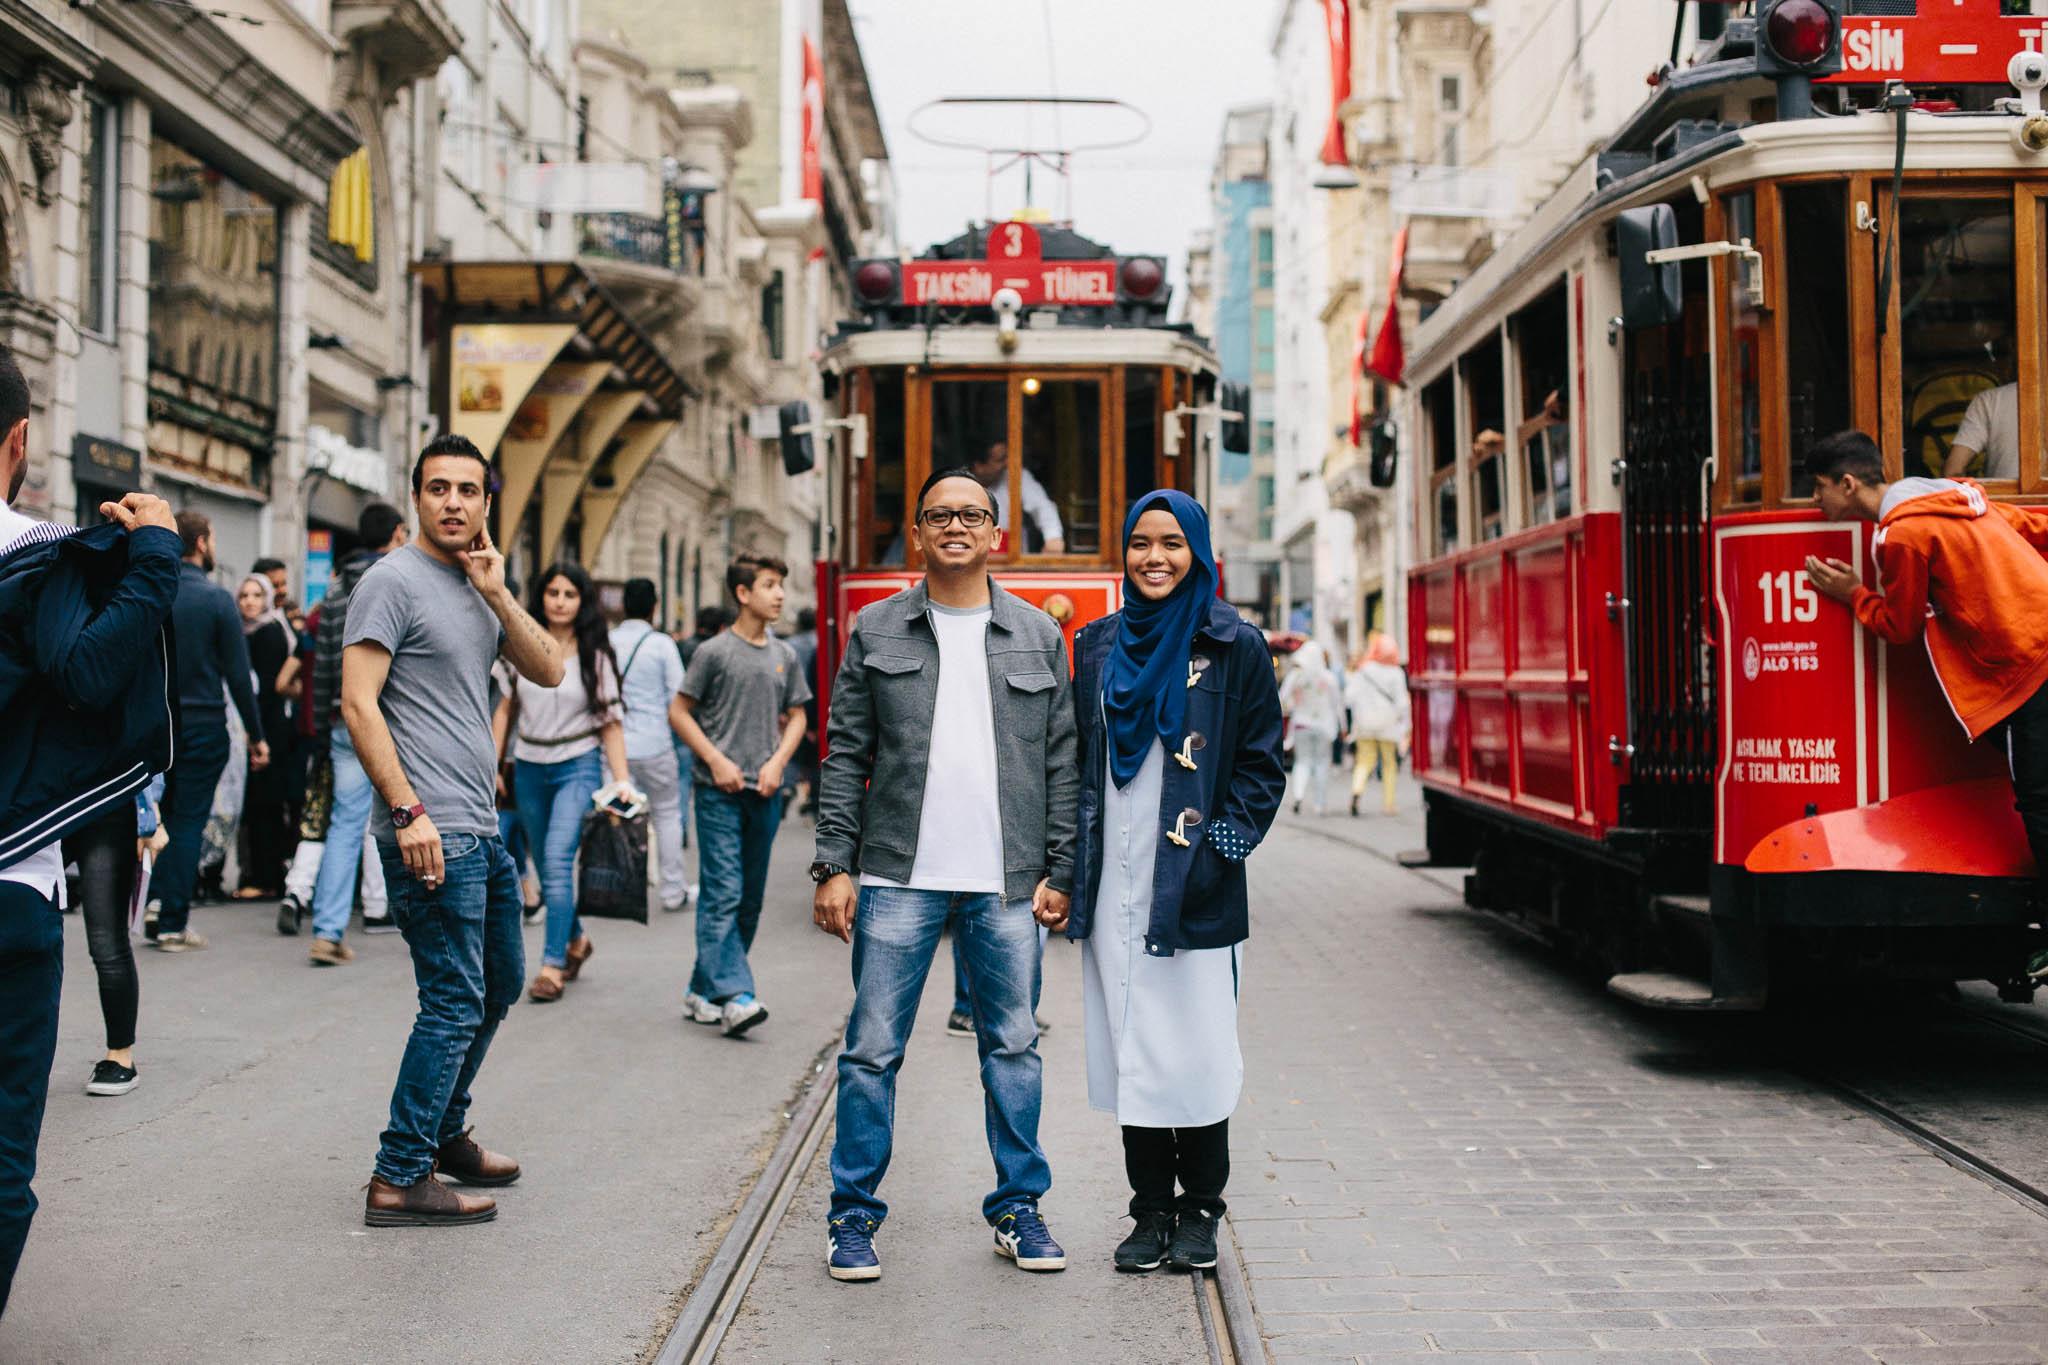 singapore-wedding-photographer-dzul-isma-istanbul-wmt-24.jpg